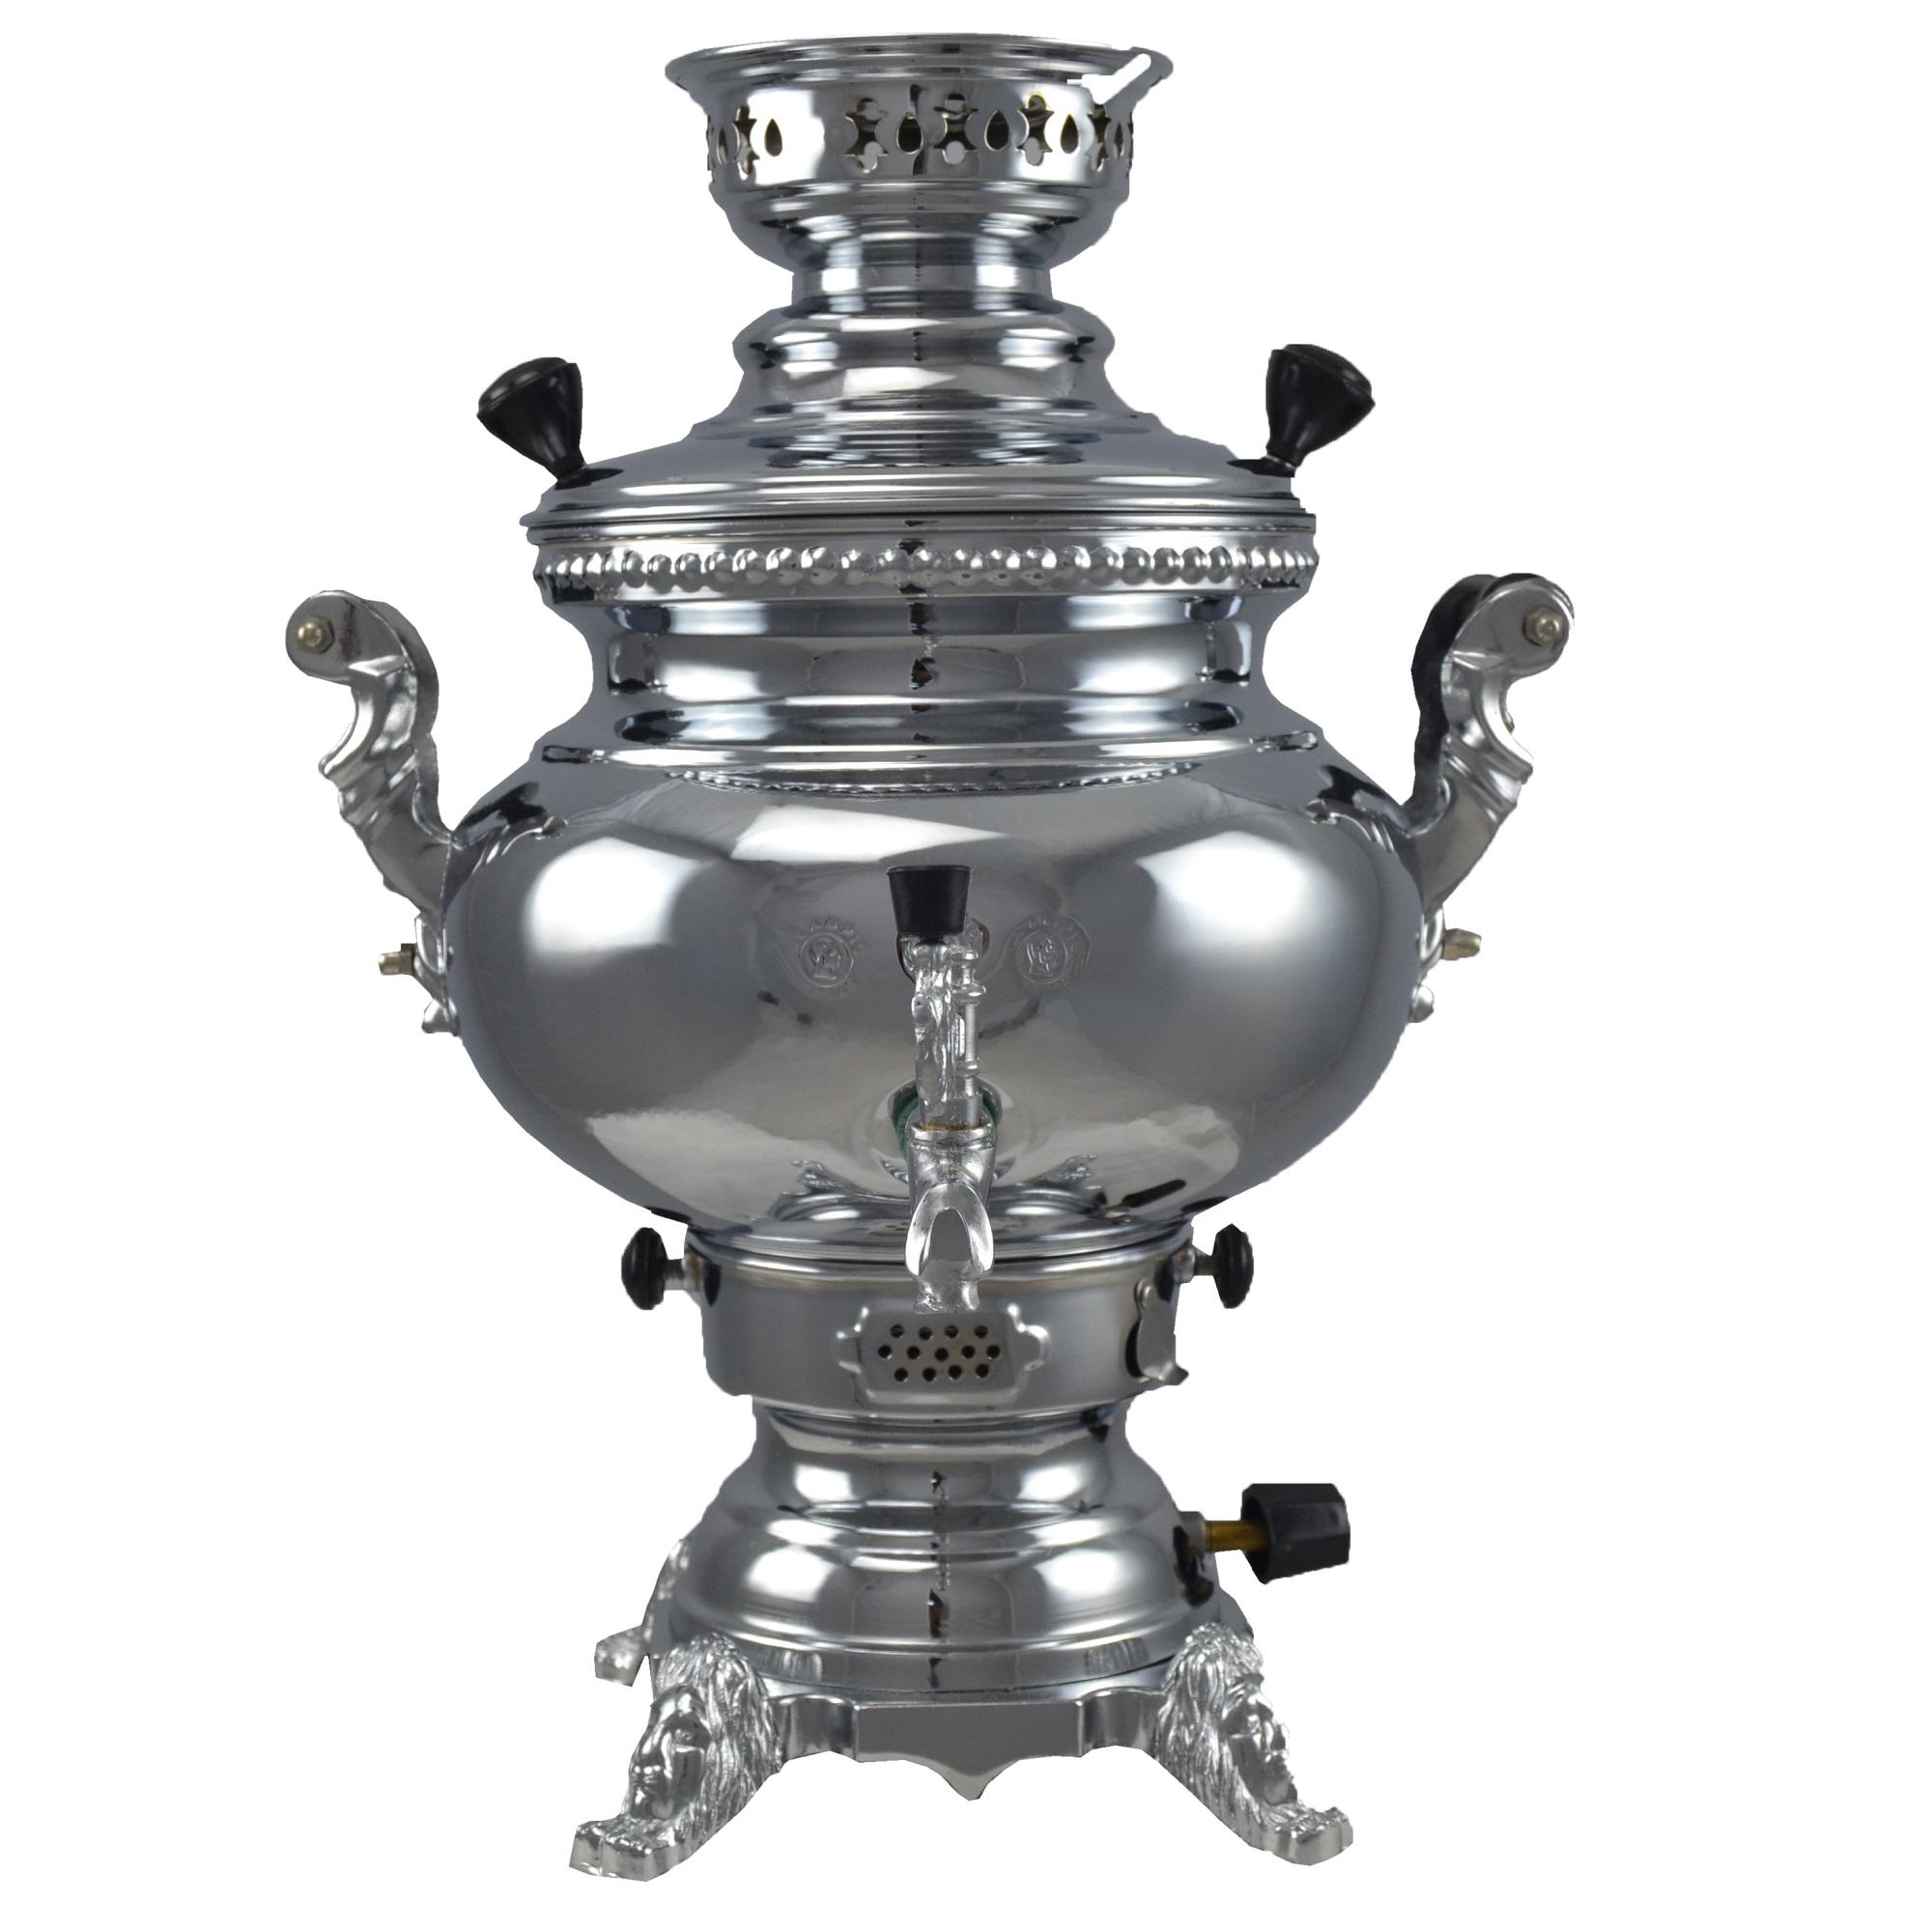 سماور گازی مدل المپیک 9 ظرفیت 6 لیتر